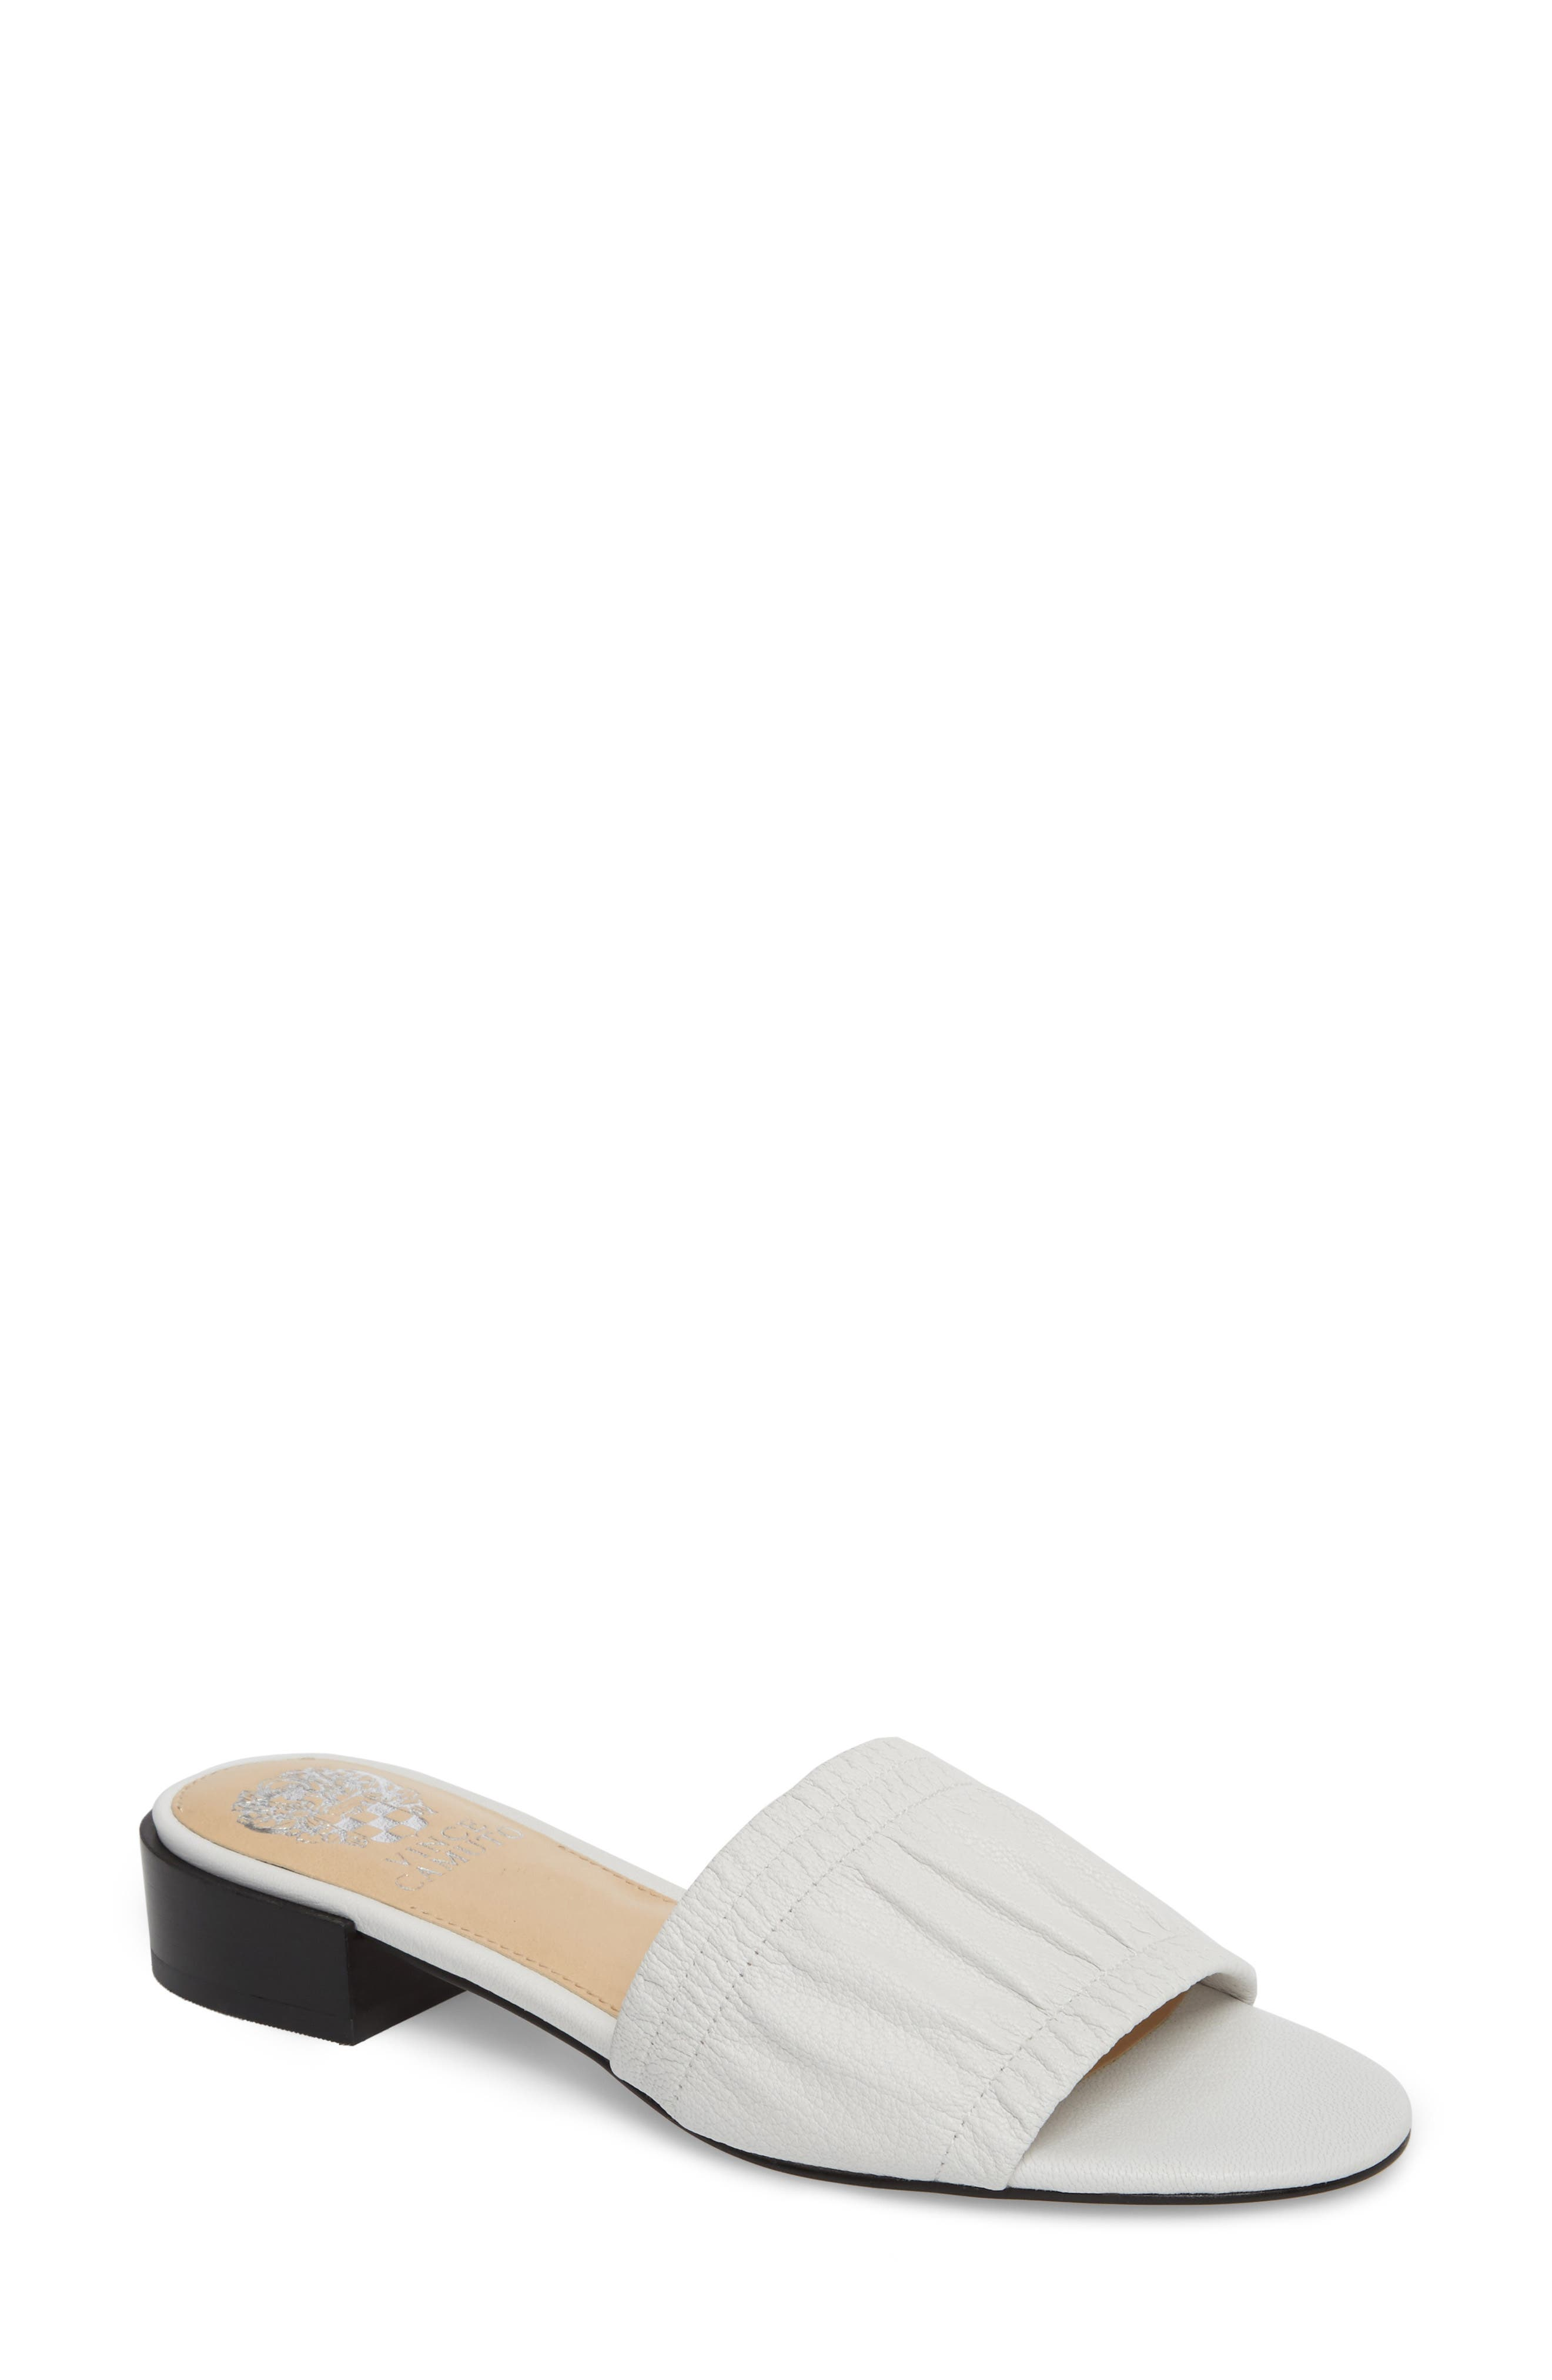 Nanita Pleated Slide Sandal,                         Main,                         color,